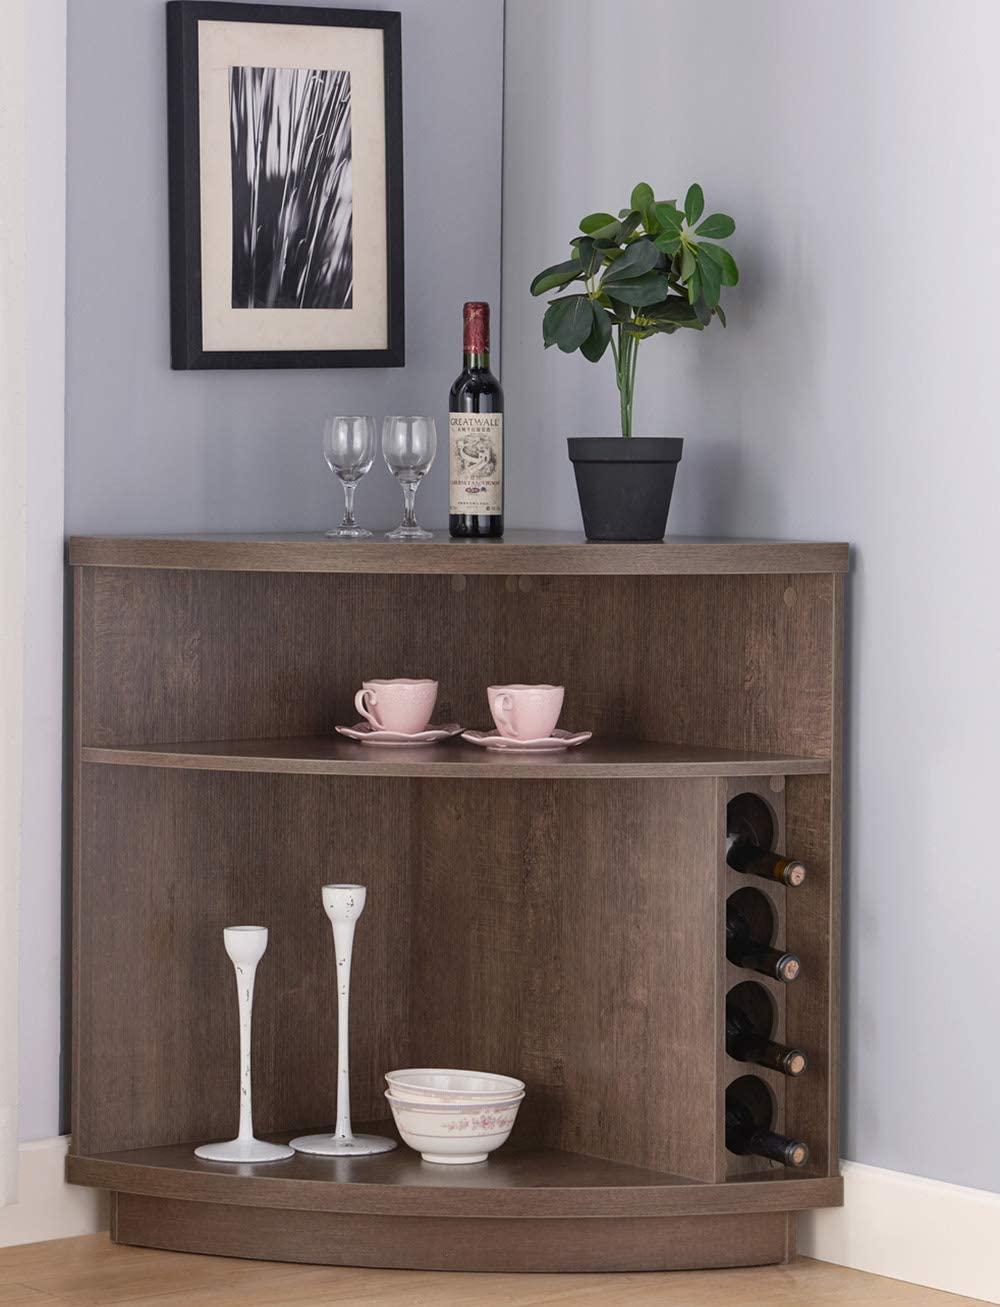 Amadeus Mid Century Retro Console Corner Cabinet for Wine Storage (Walnut Oak Color)